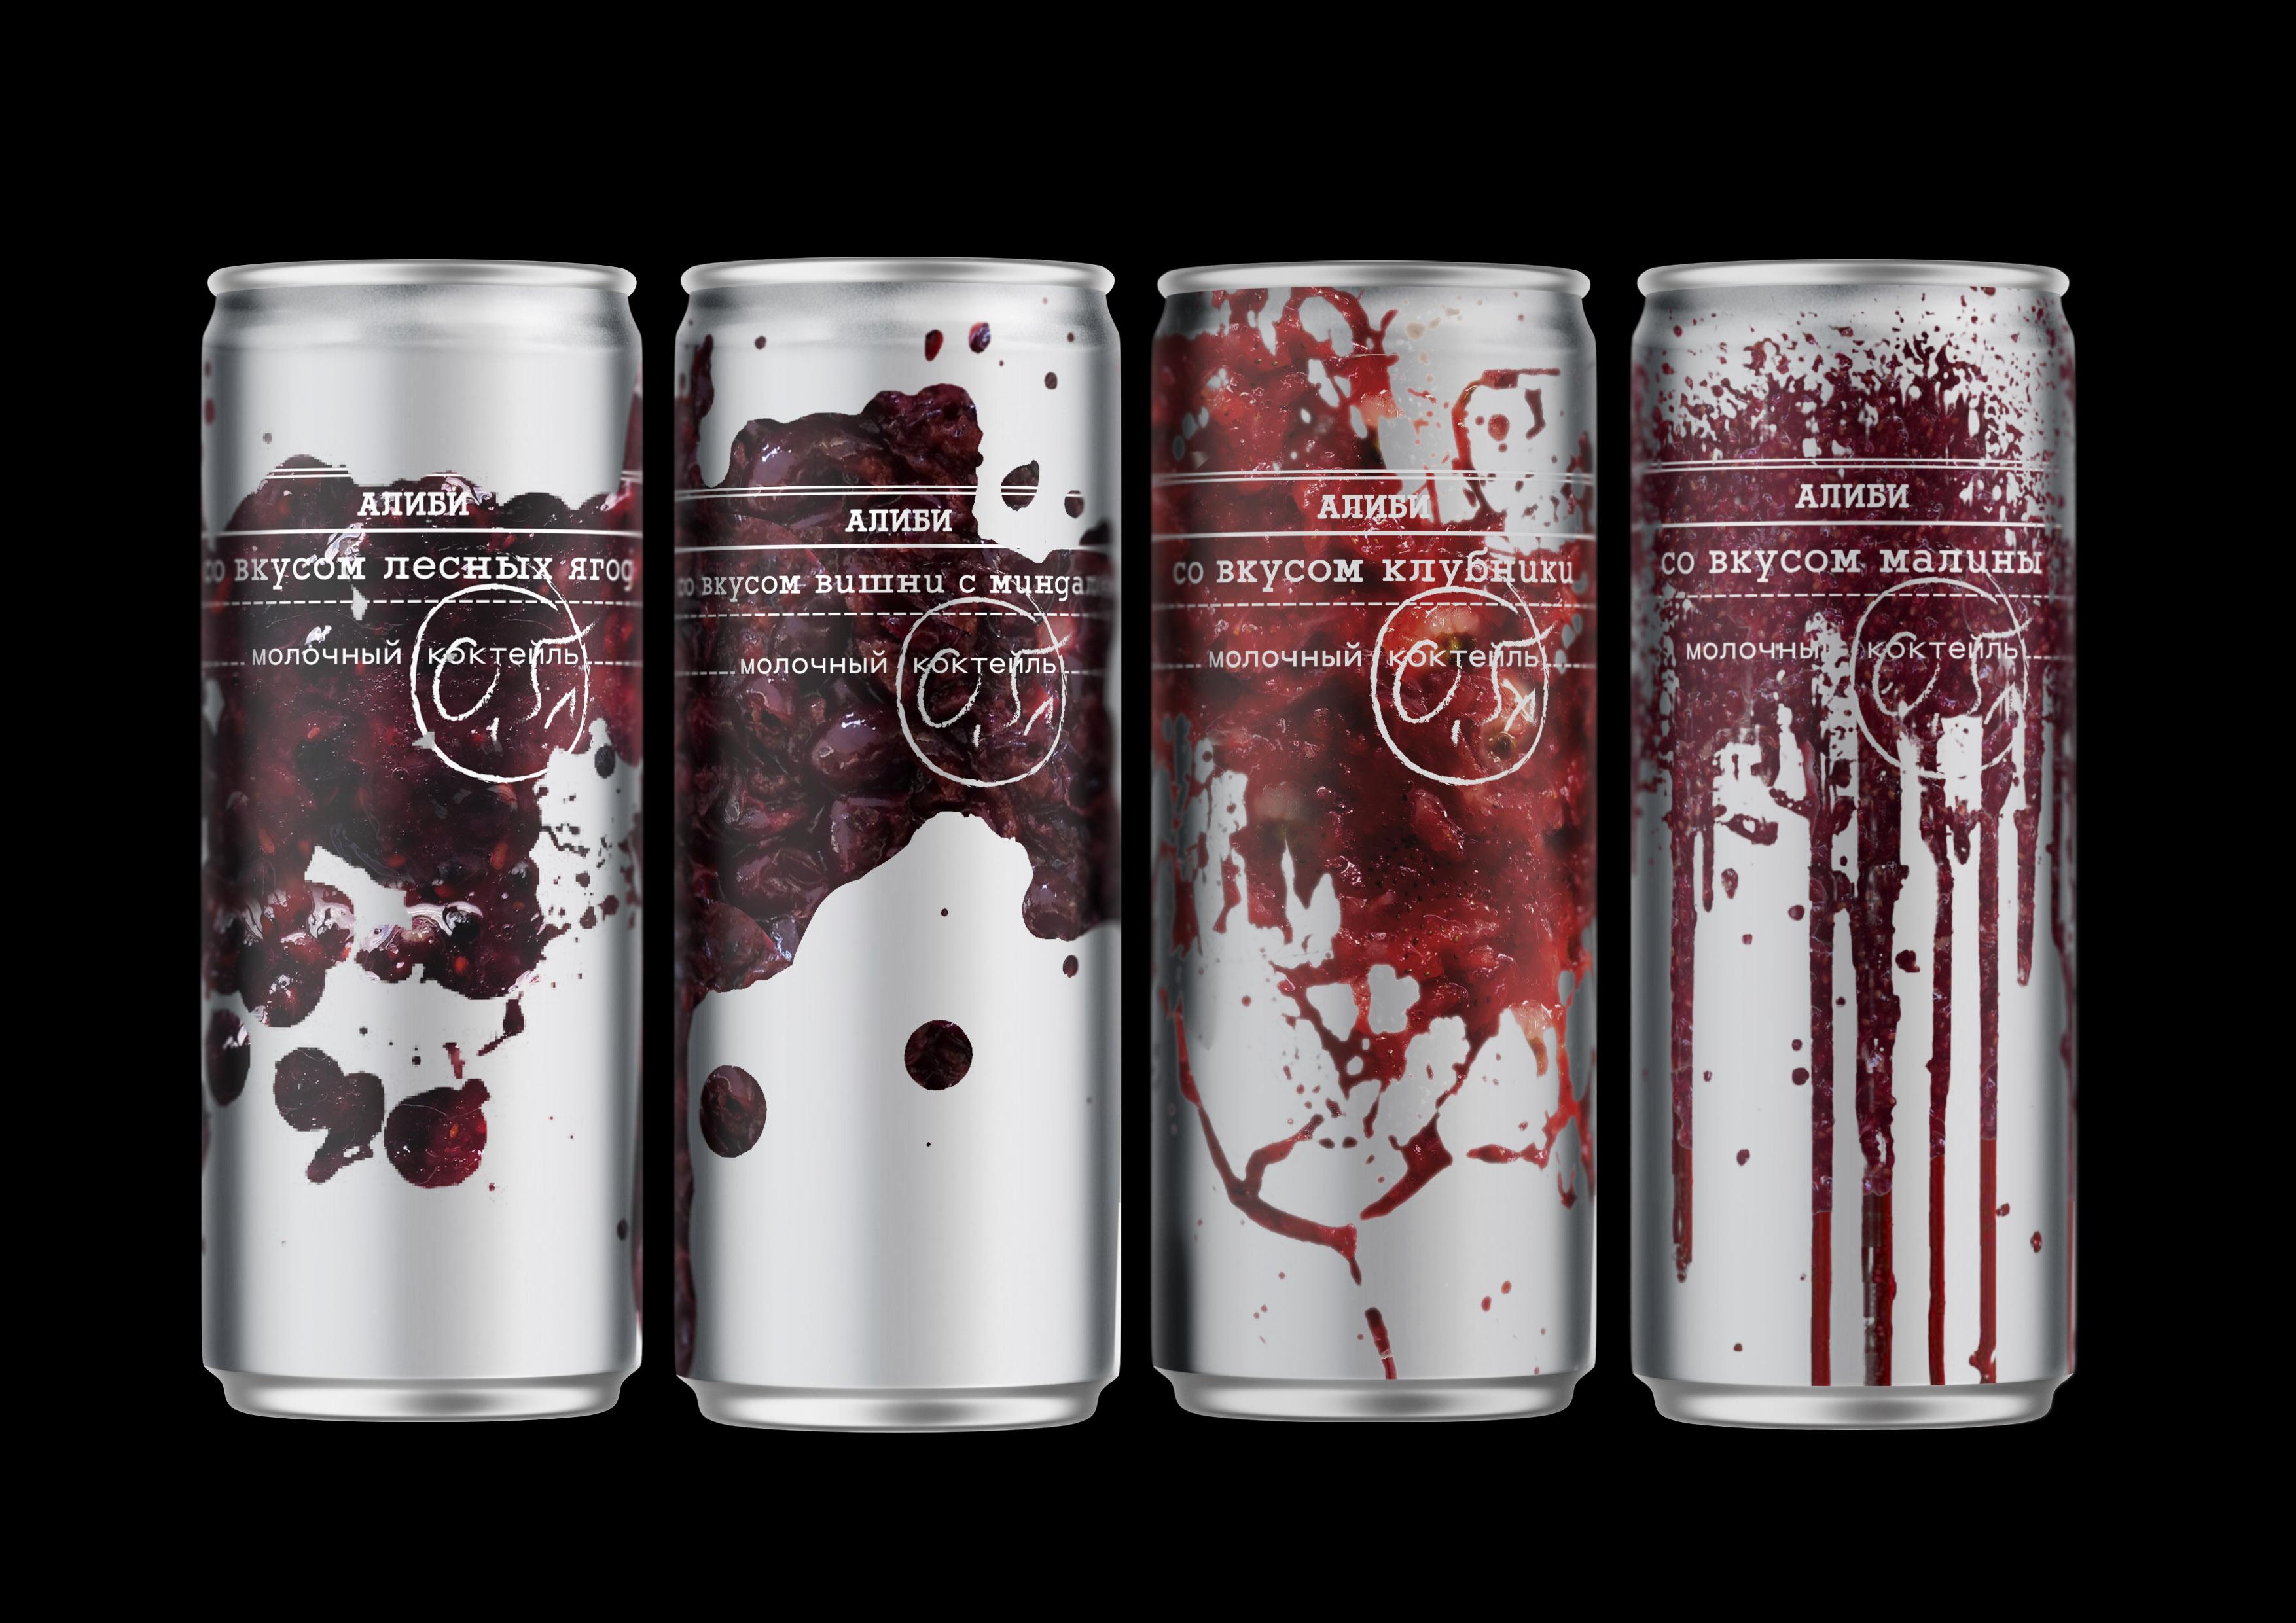 Packaging Design Student Concept for Alibi Milkshake by Darya Lugovskaya